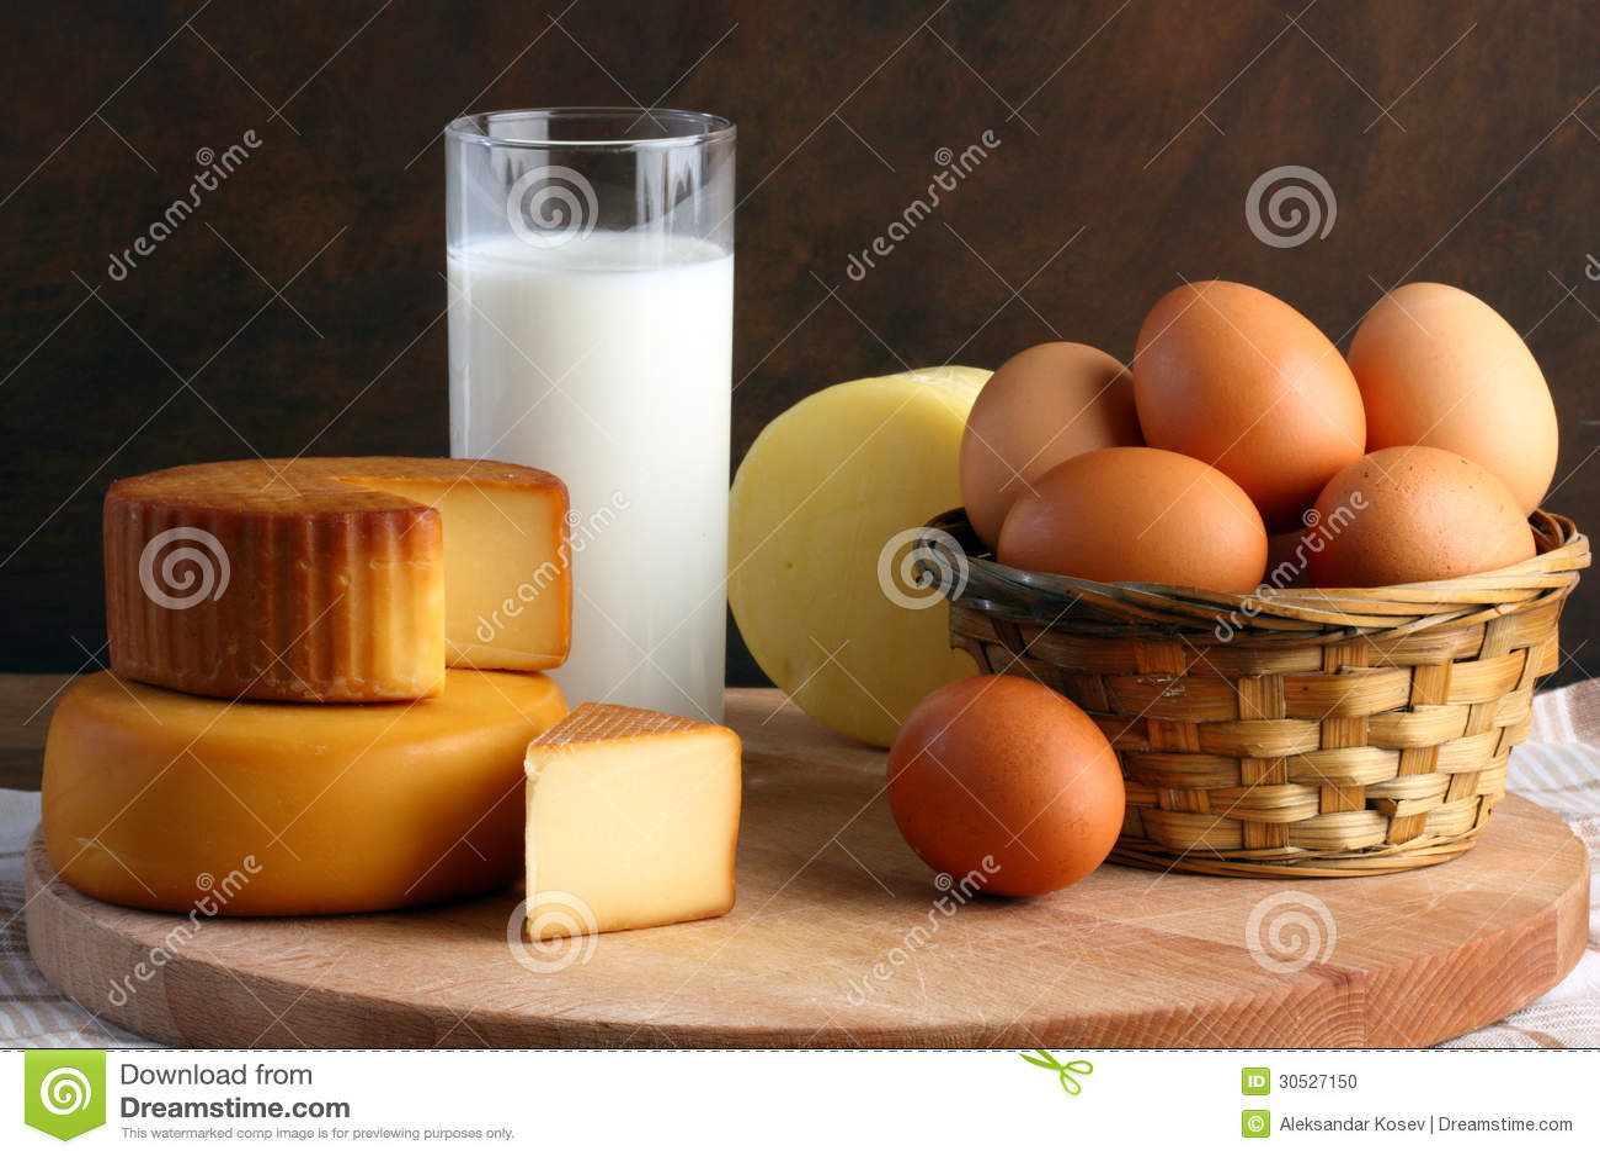 Ser, mleko i jajka,